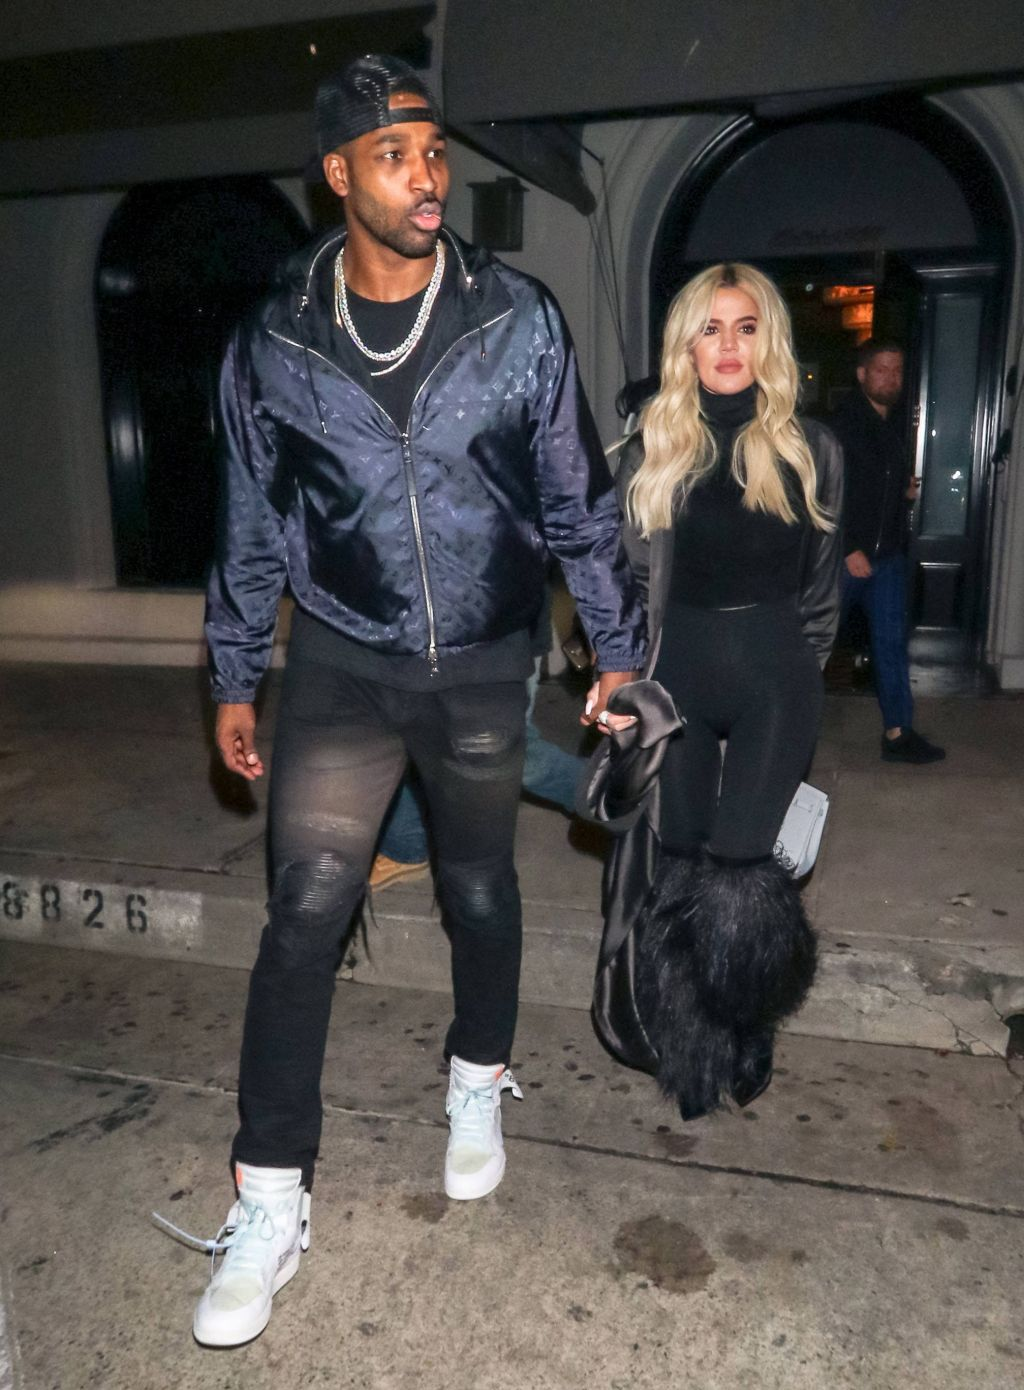 Khloe Kardashian, ex boyfriend Tristan Thompson